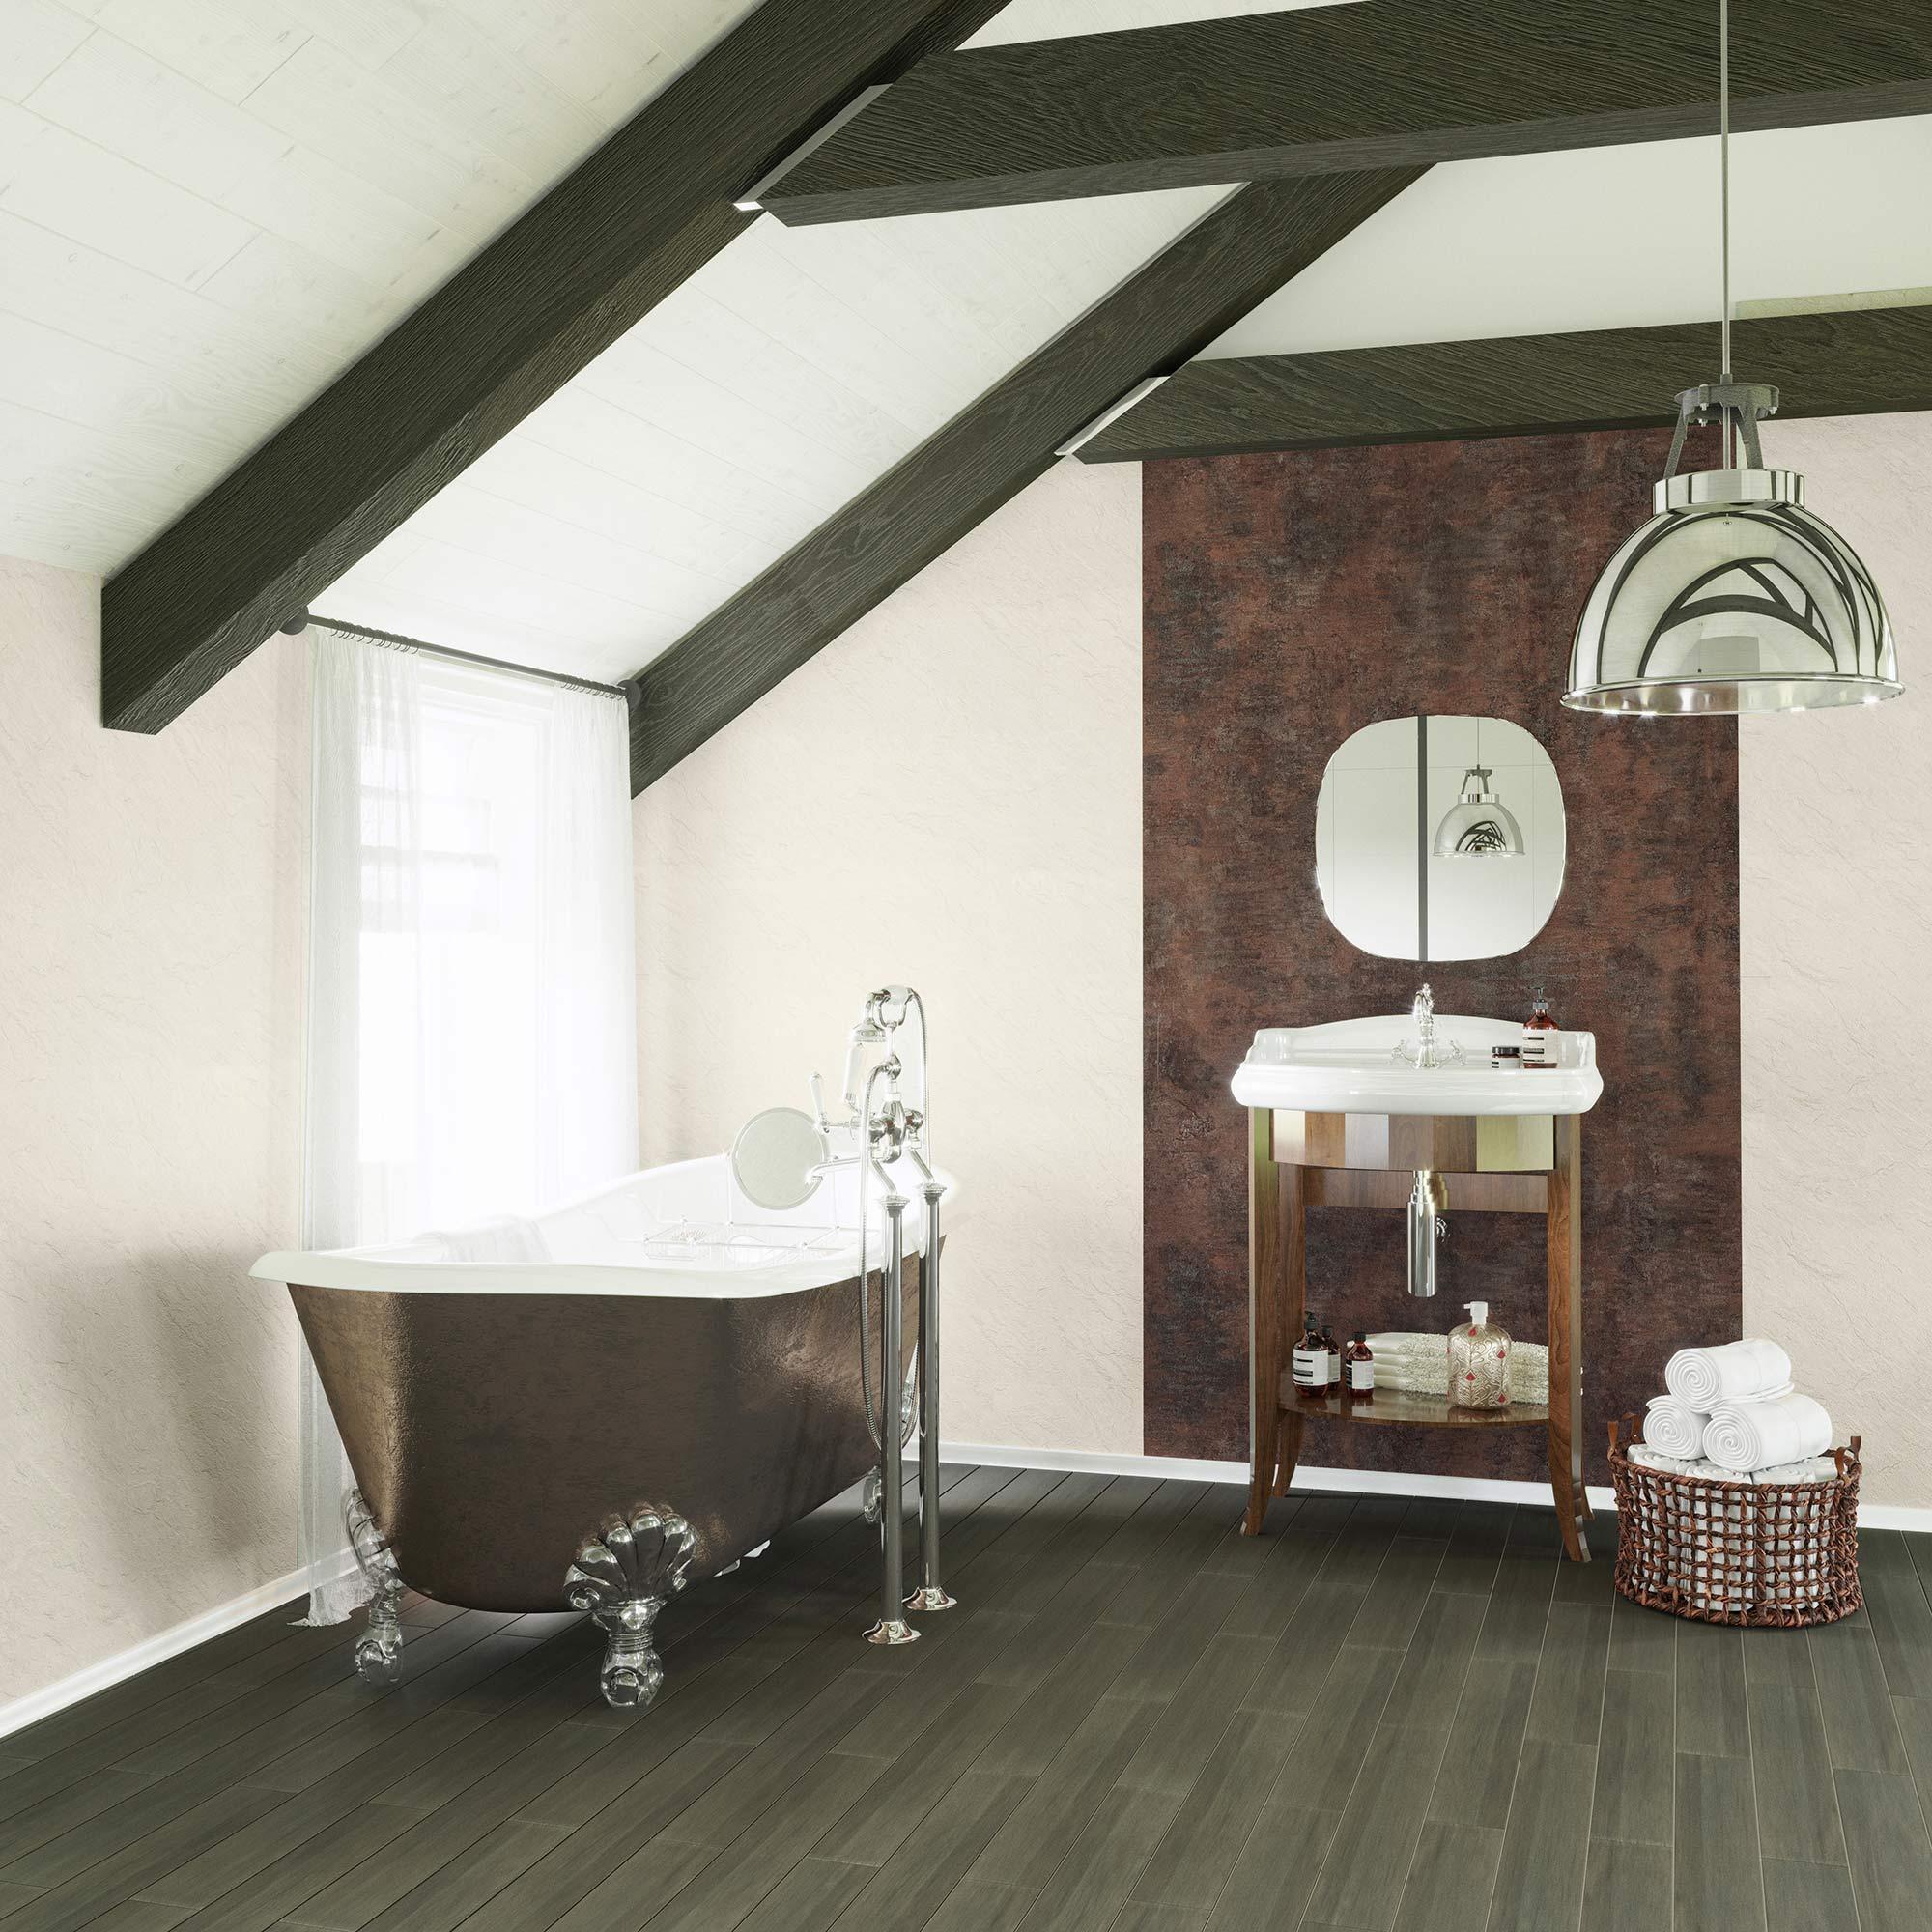 Corten Elements Bathroom Cladding Direct